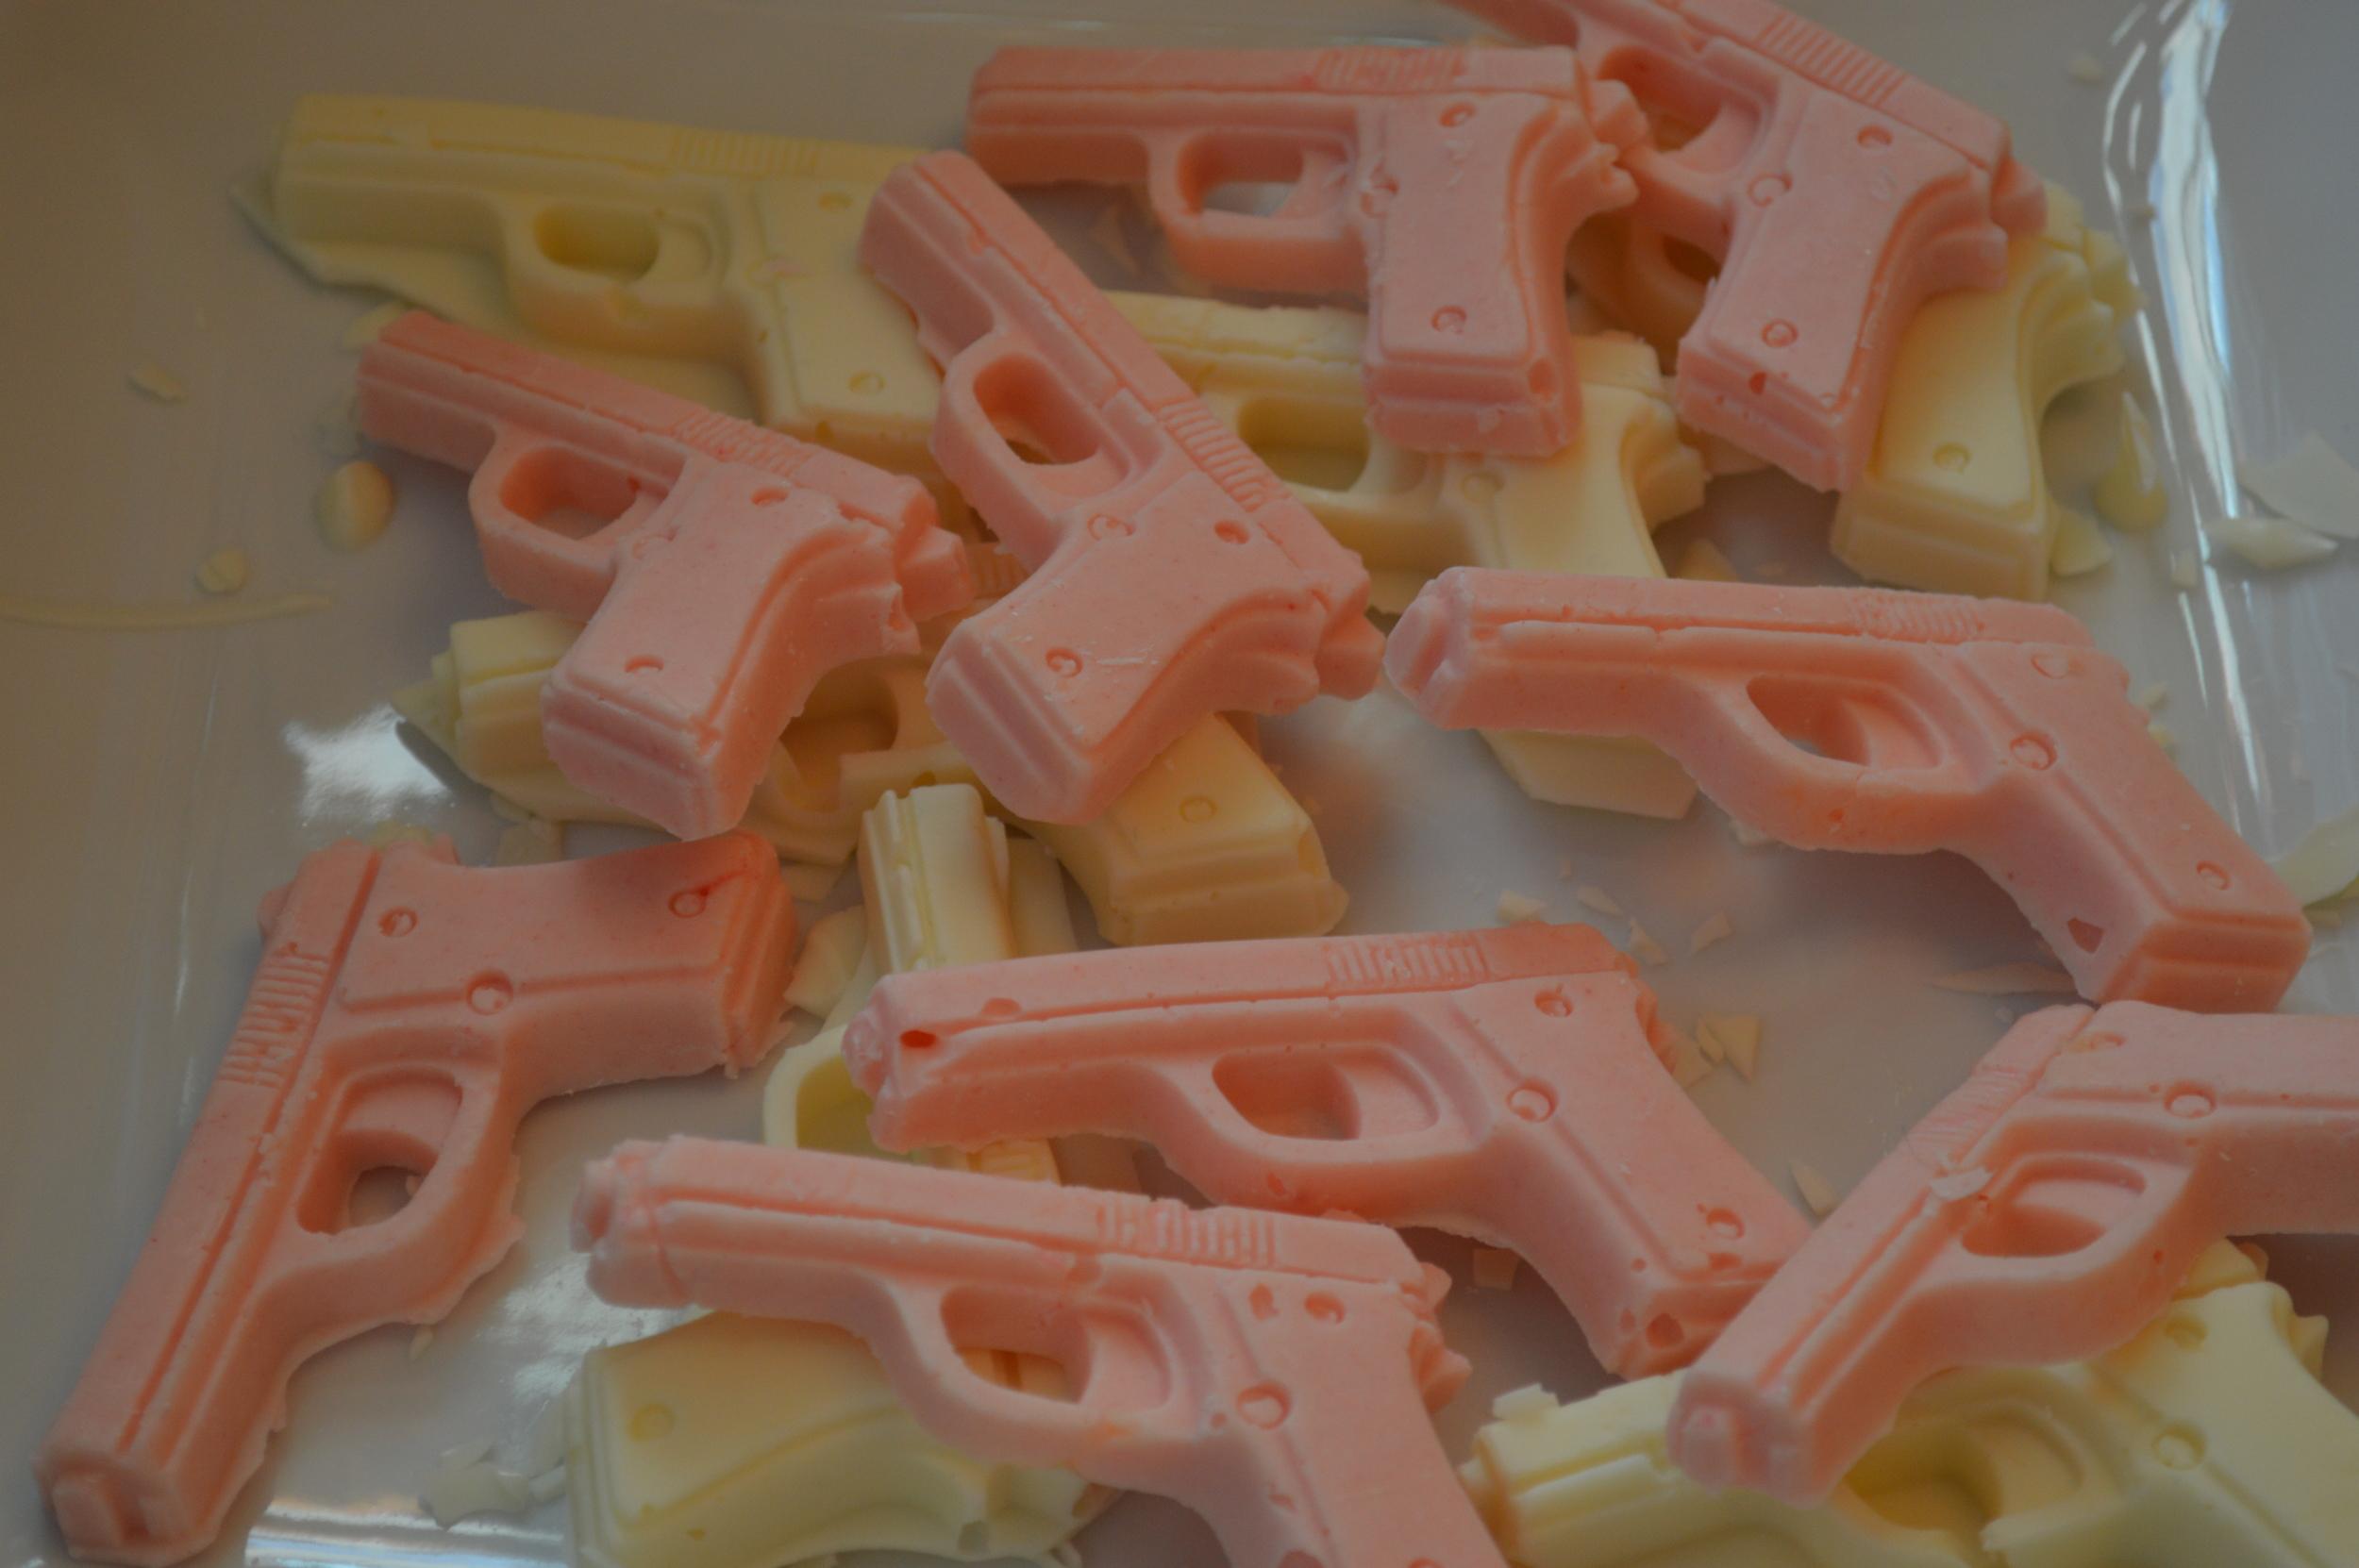 White chocolate guns to garnish ice cream sundaes referencing Kristin's work with the Second Amendment